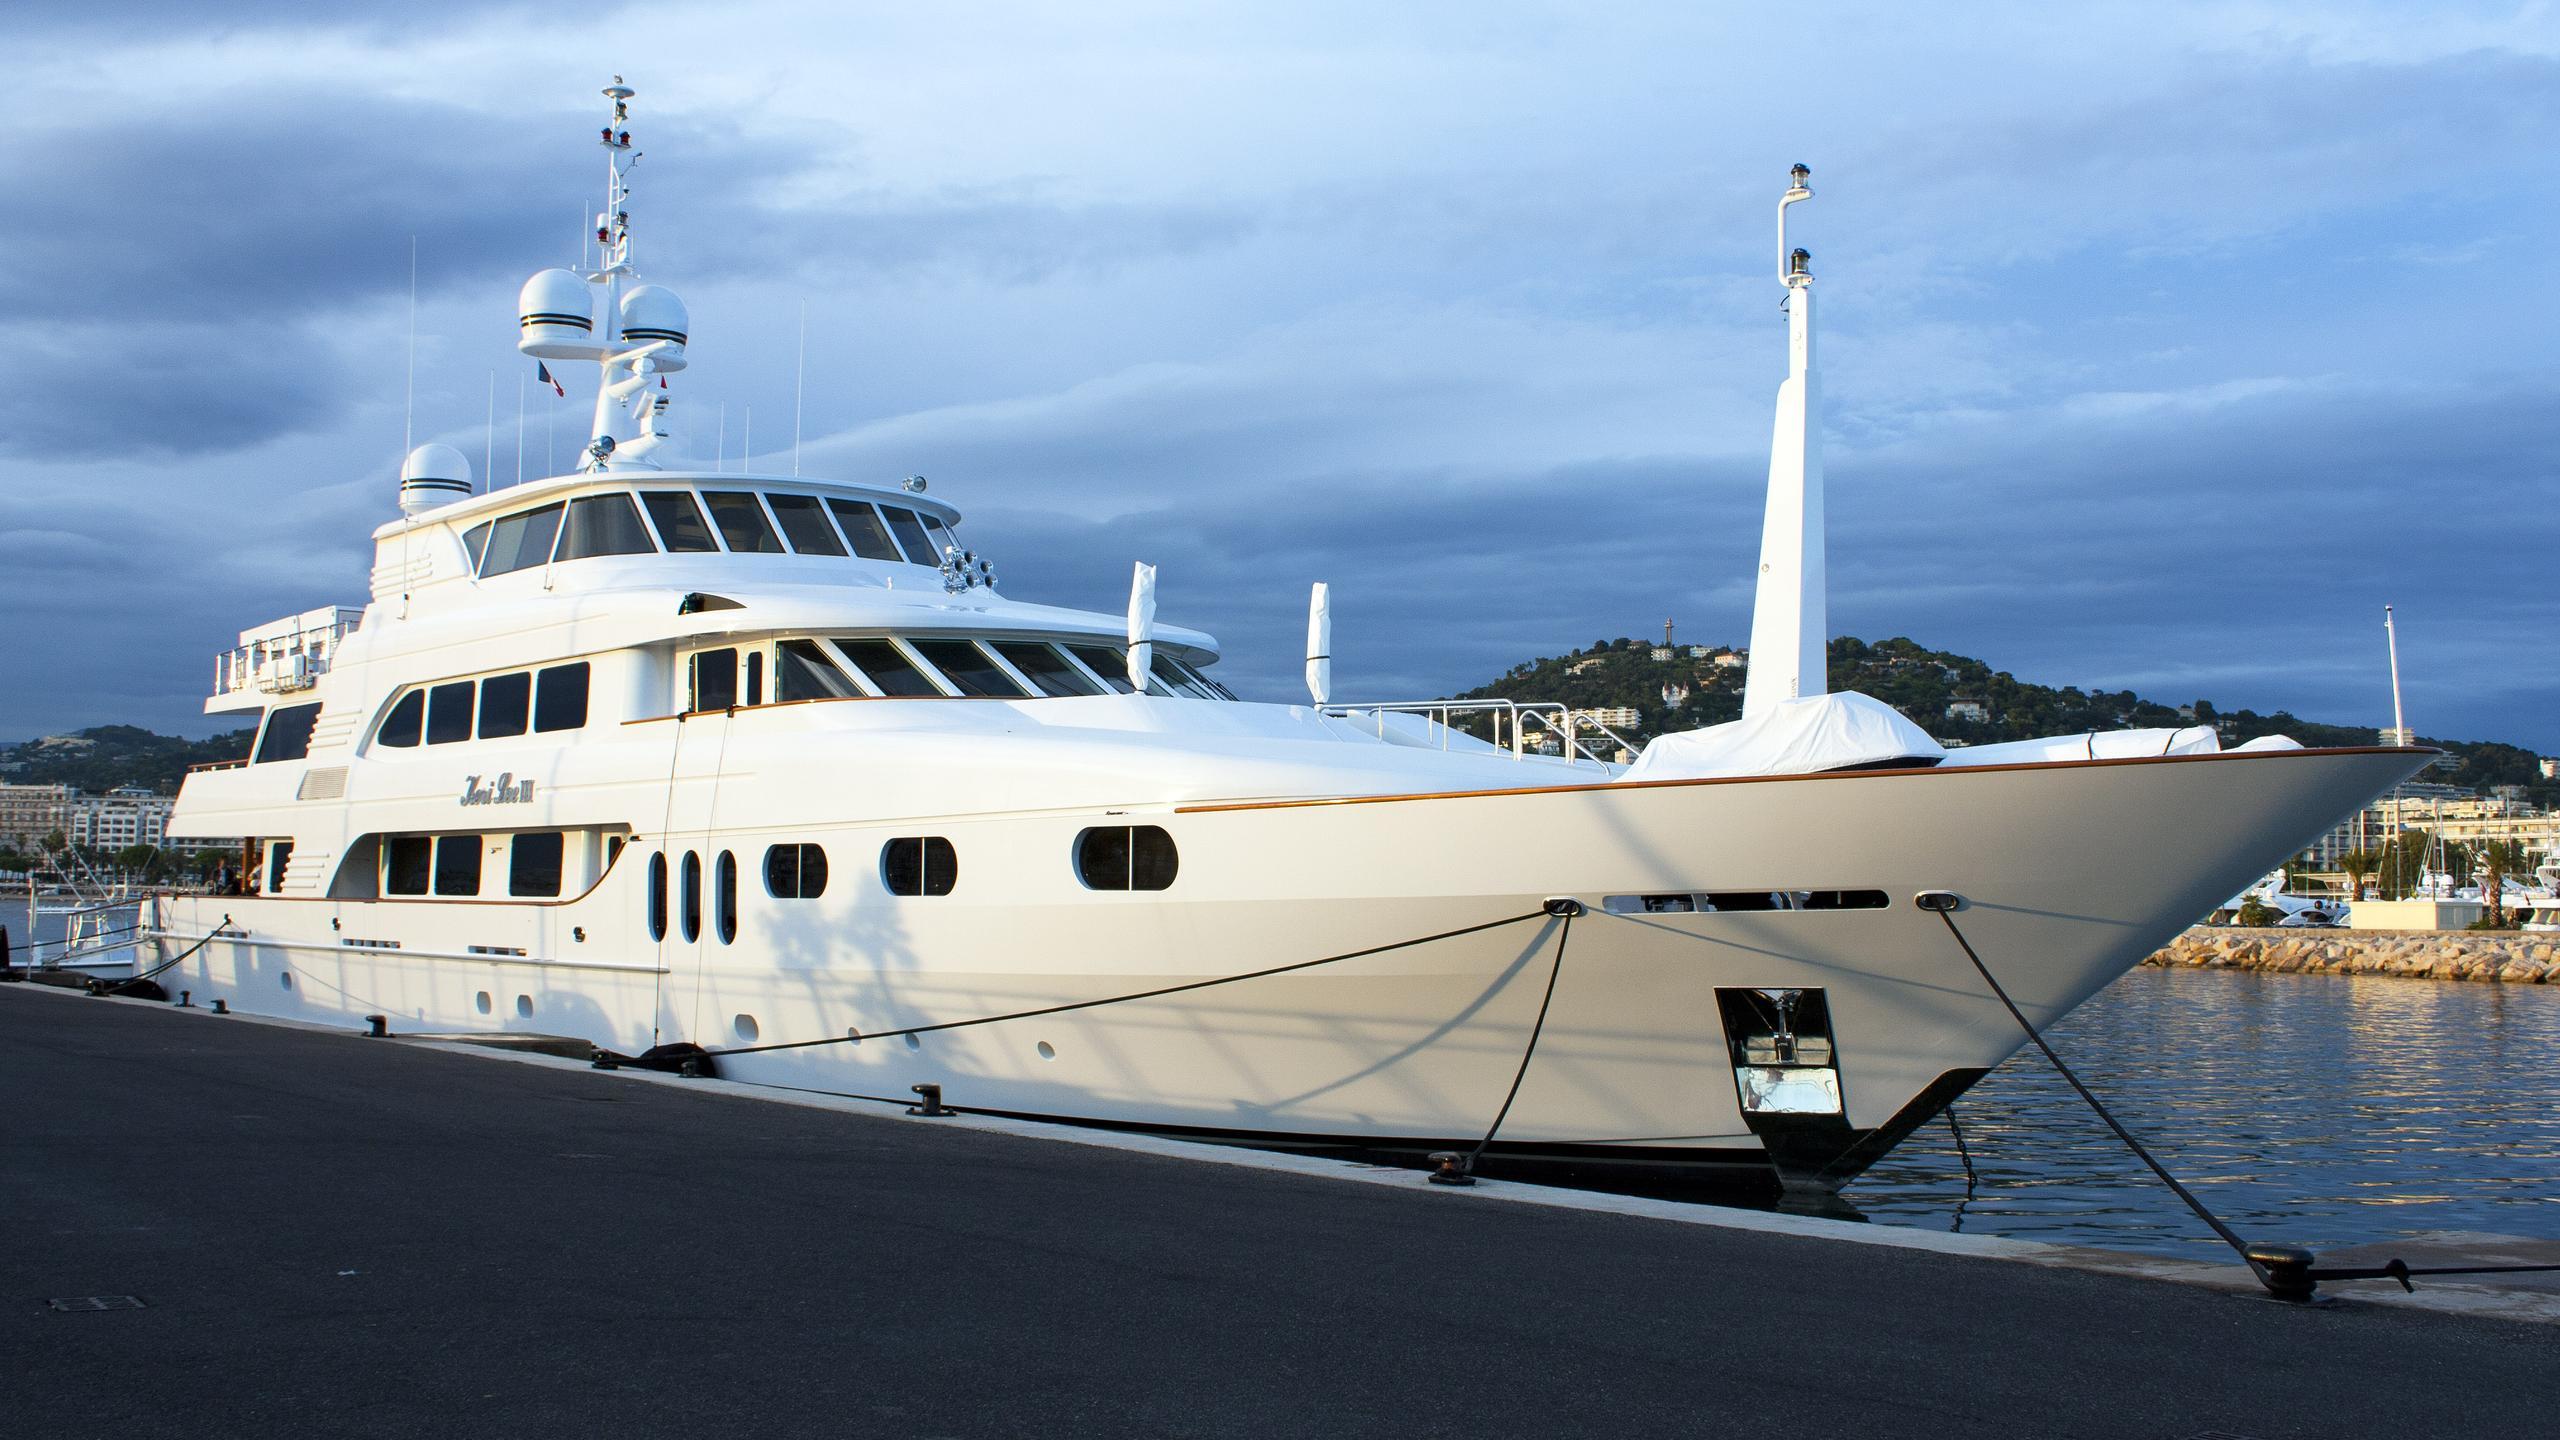 keri-lee-iii-motor-yacht-trinity-2001-54m-half-profile